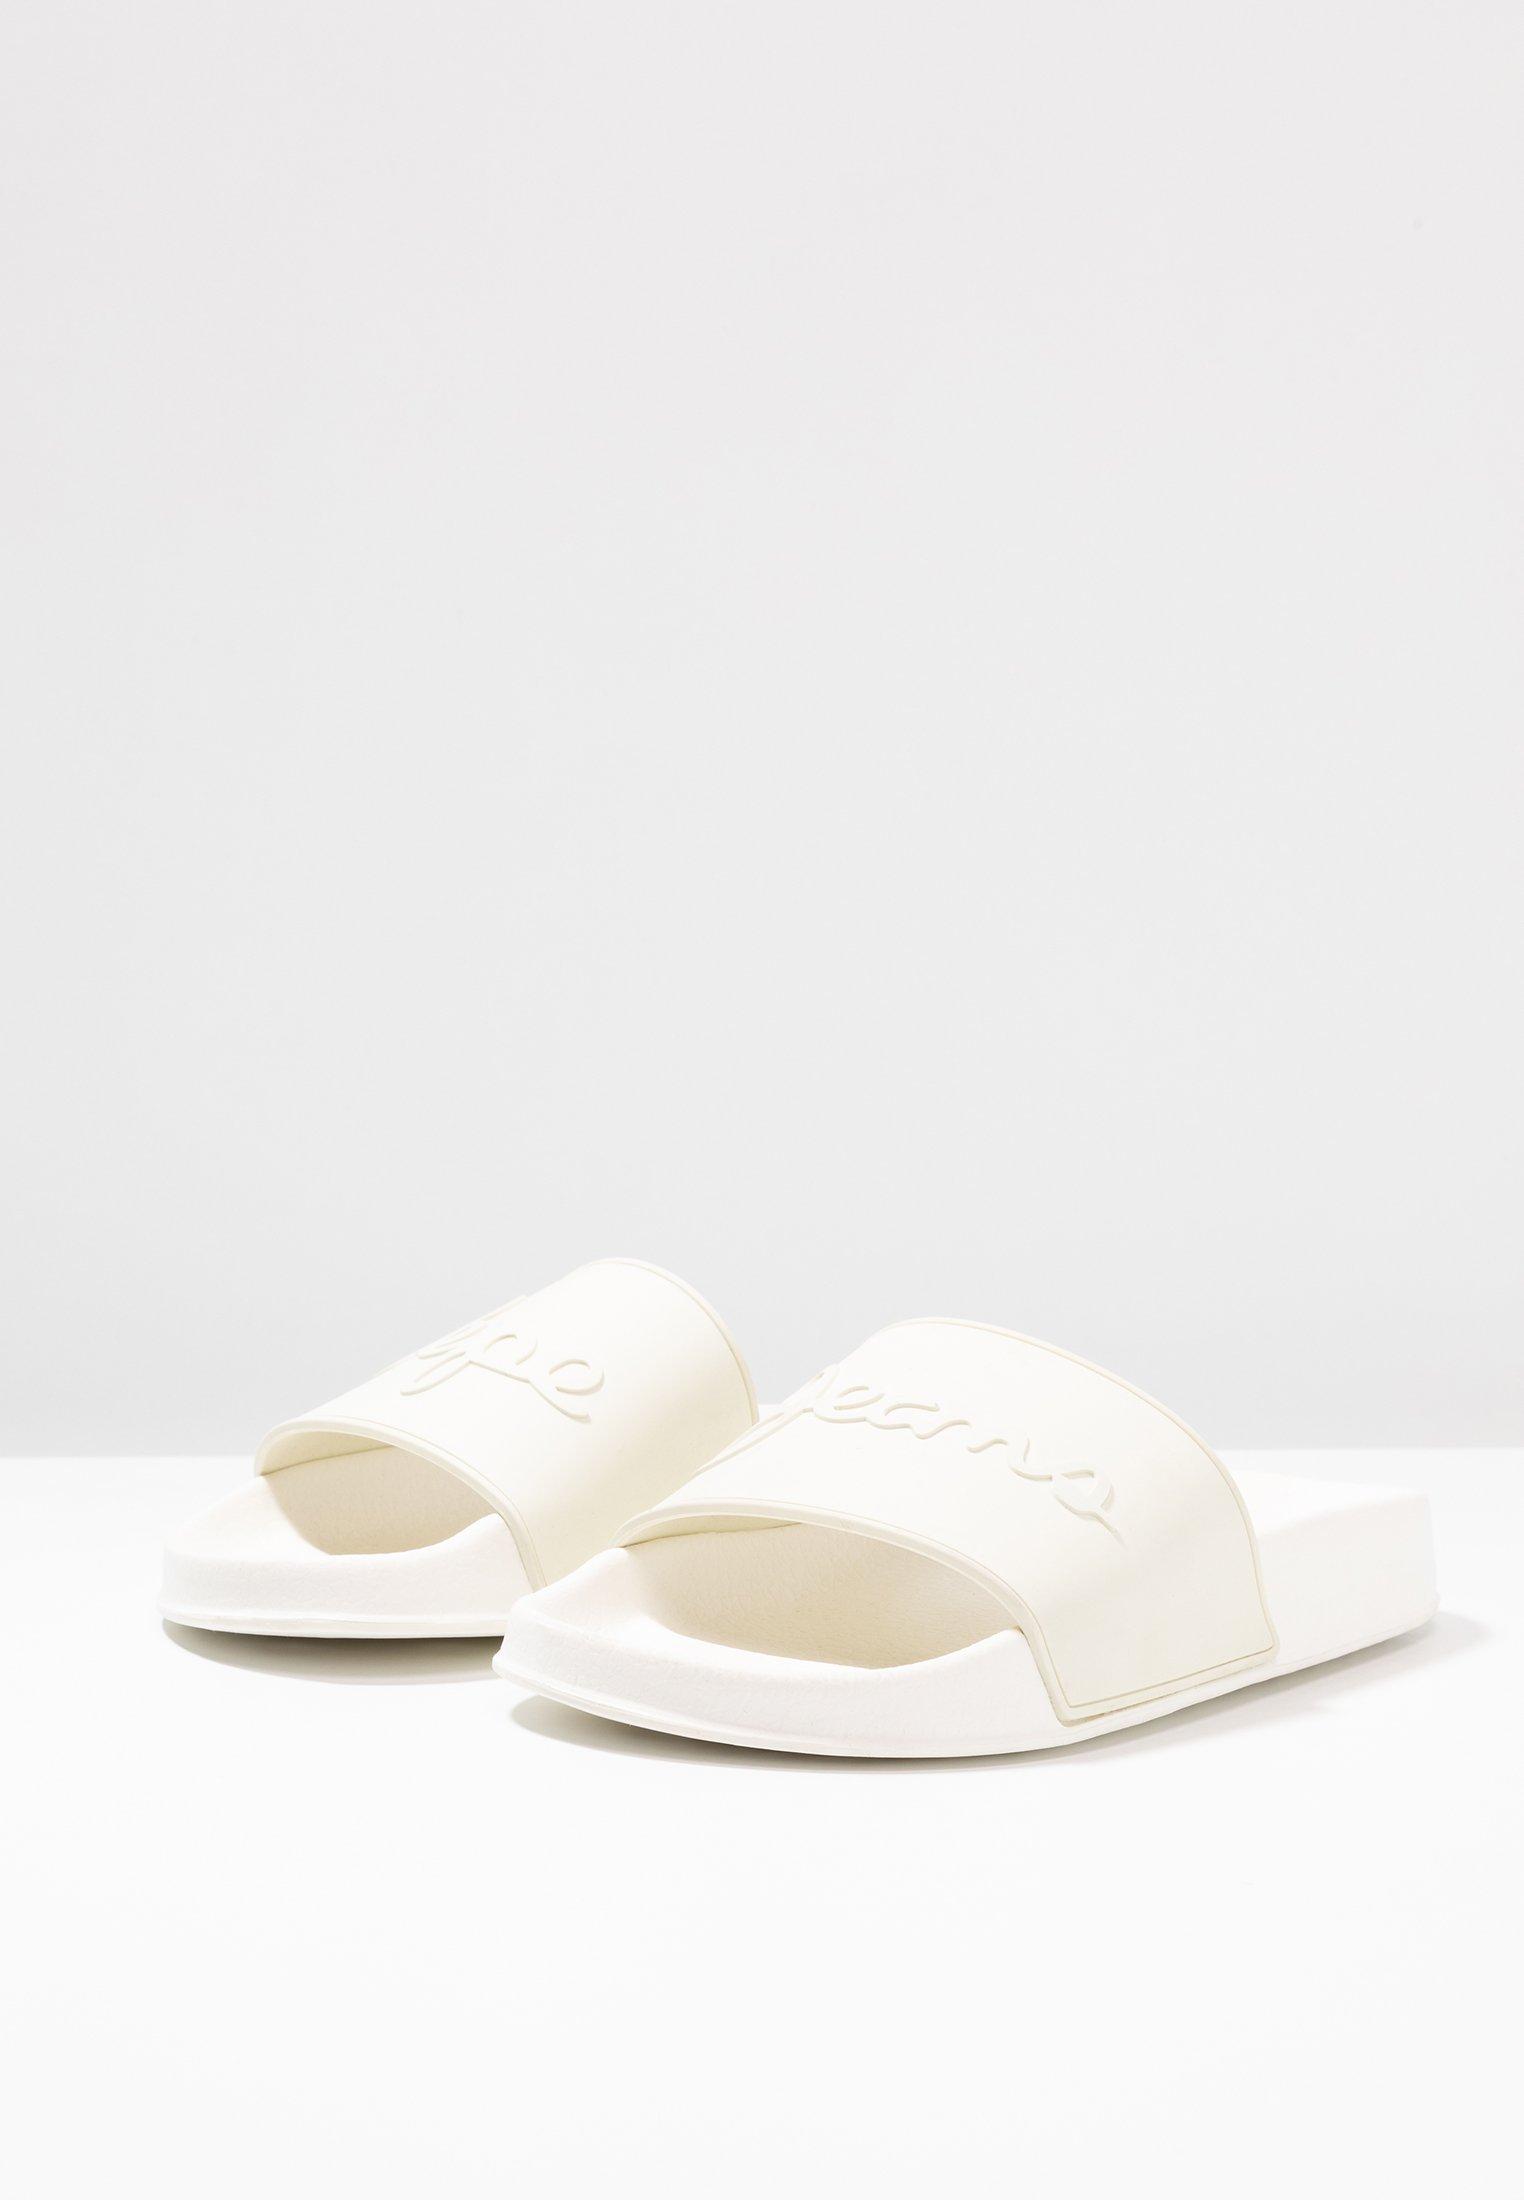 Pepe Jeans FLAP - Sandali da bagno offwhite